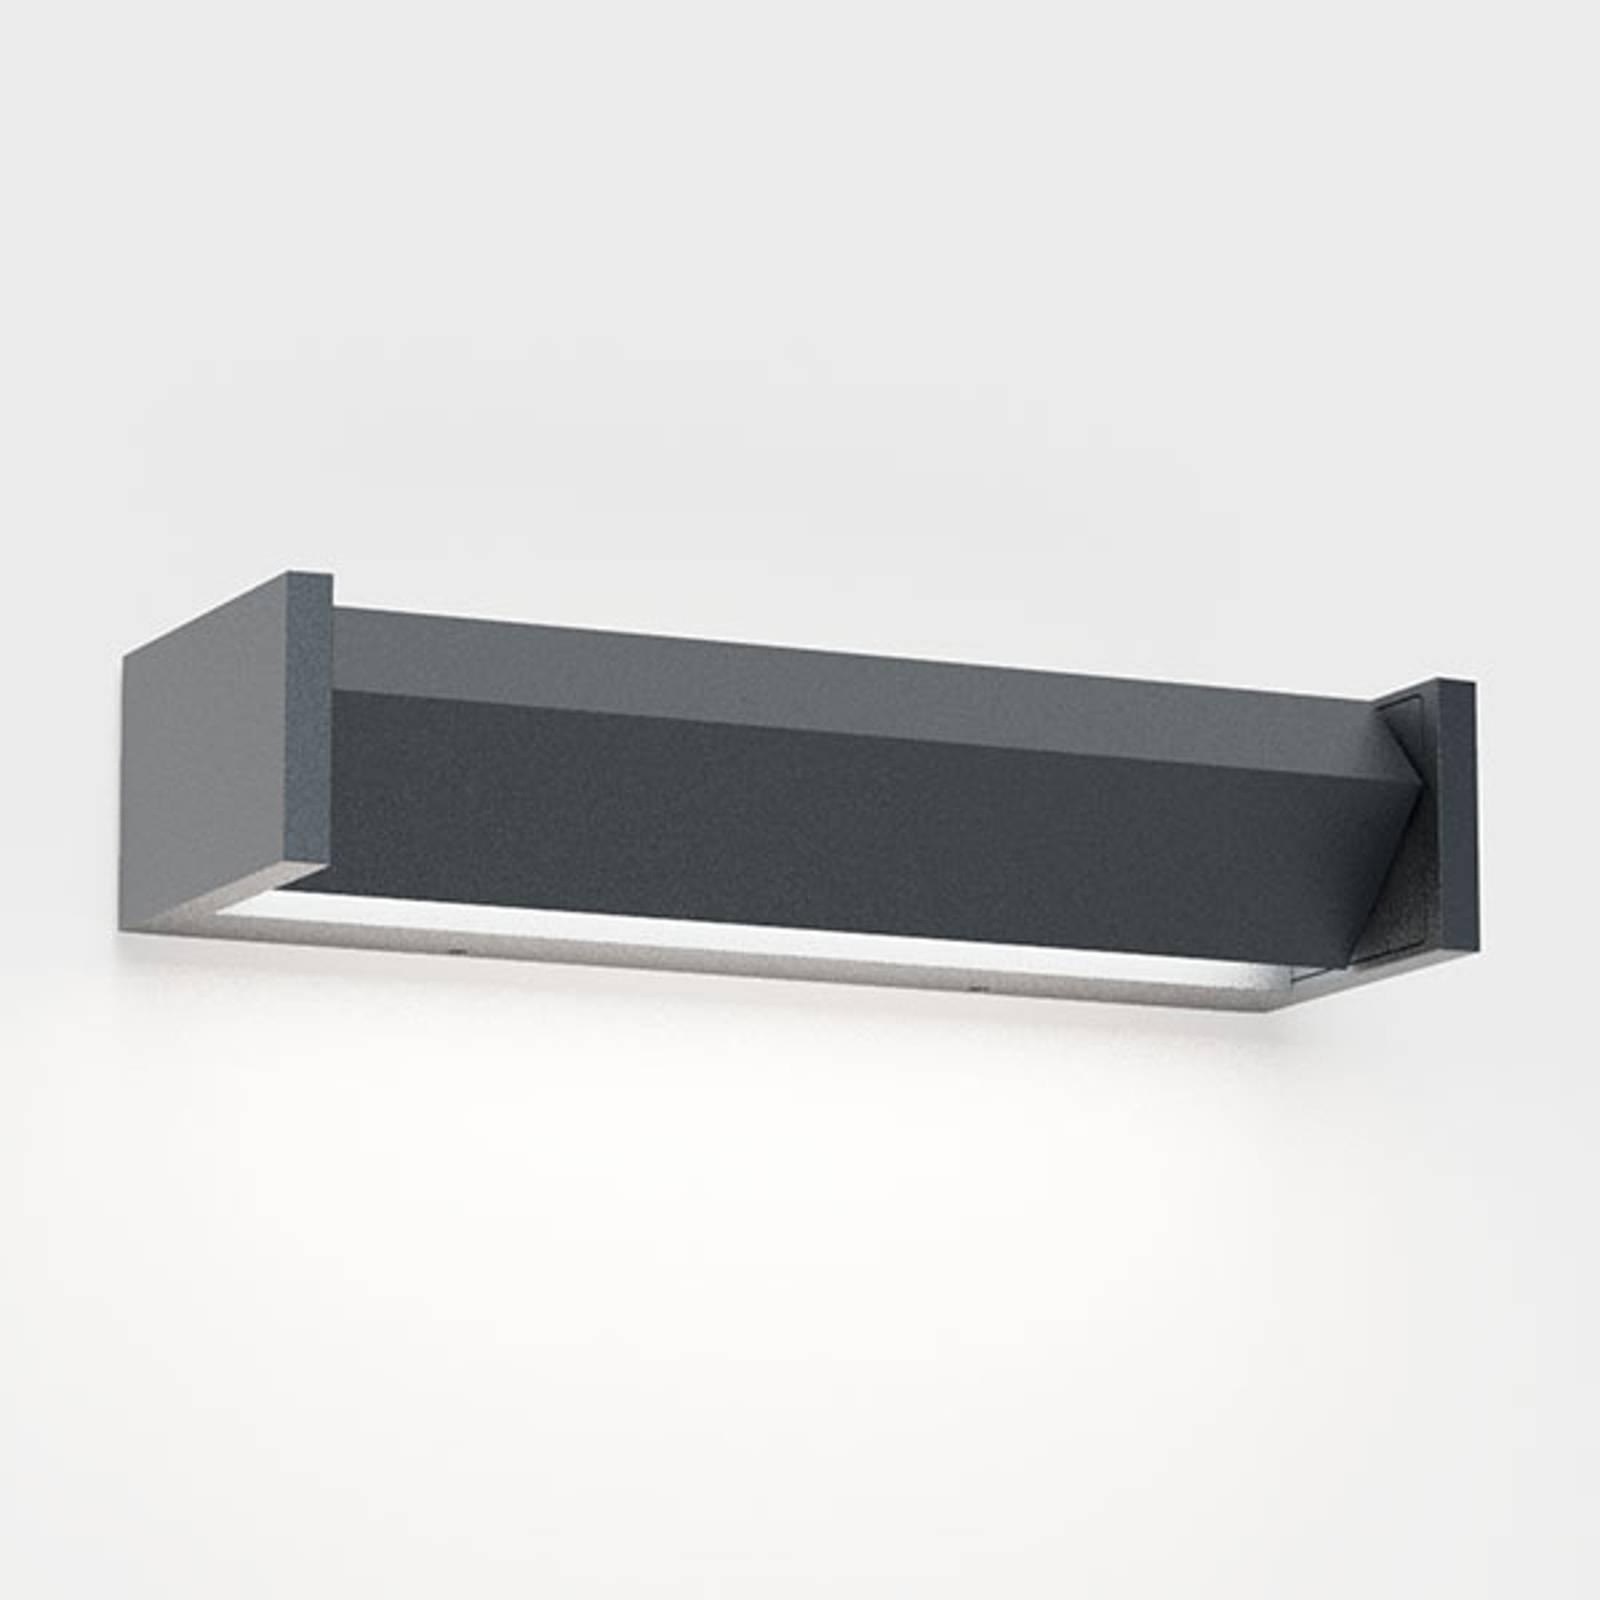 IP44.de Slat One LED-Außenwandleuchte, anthrazit